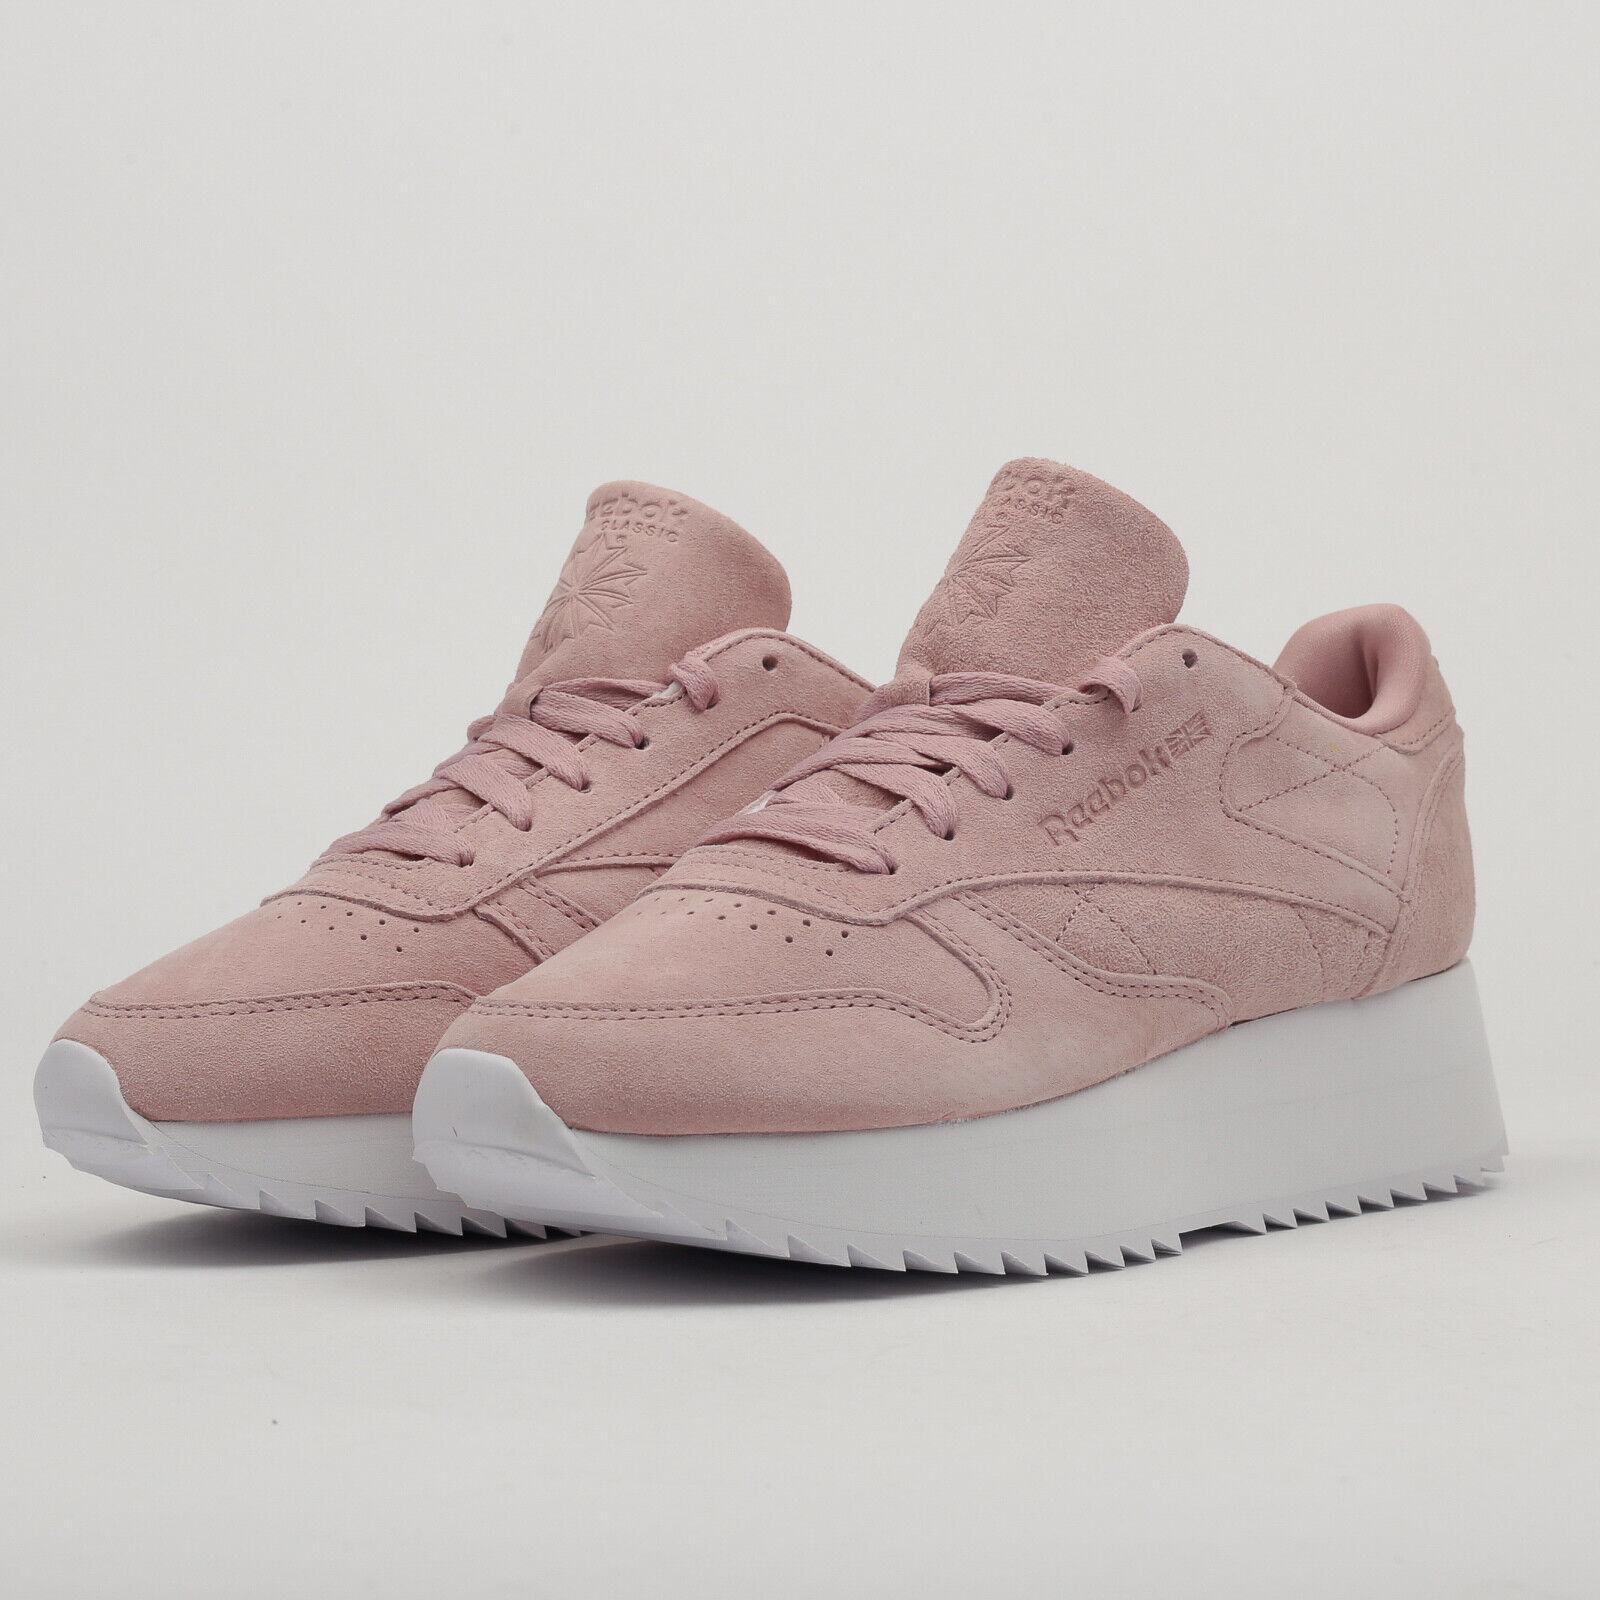 Reebok Classic Leather Double smoky pink   white EU 38, Frauen, Pink, DV3628